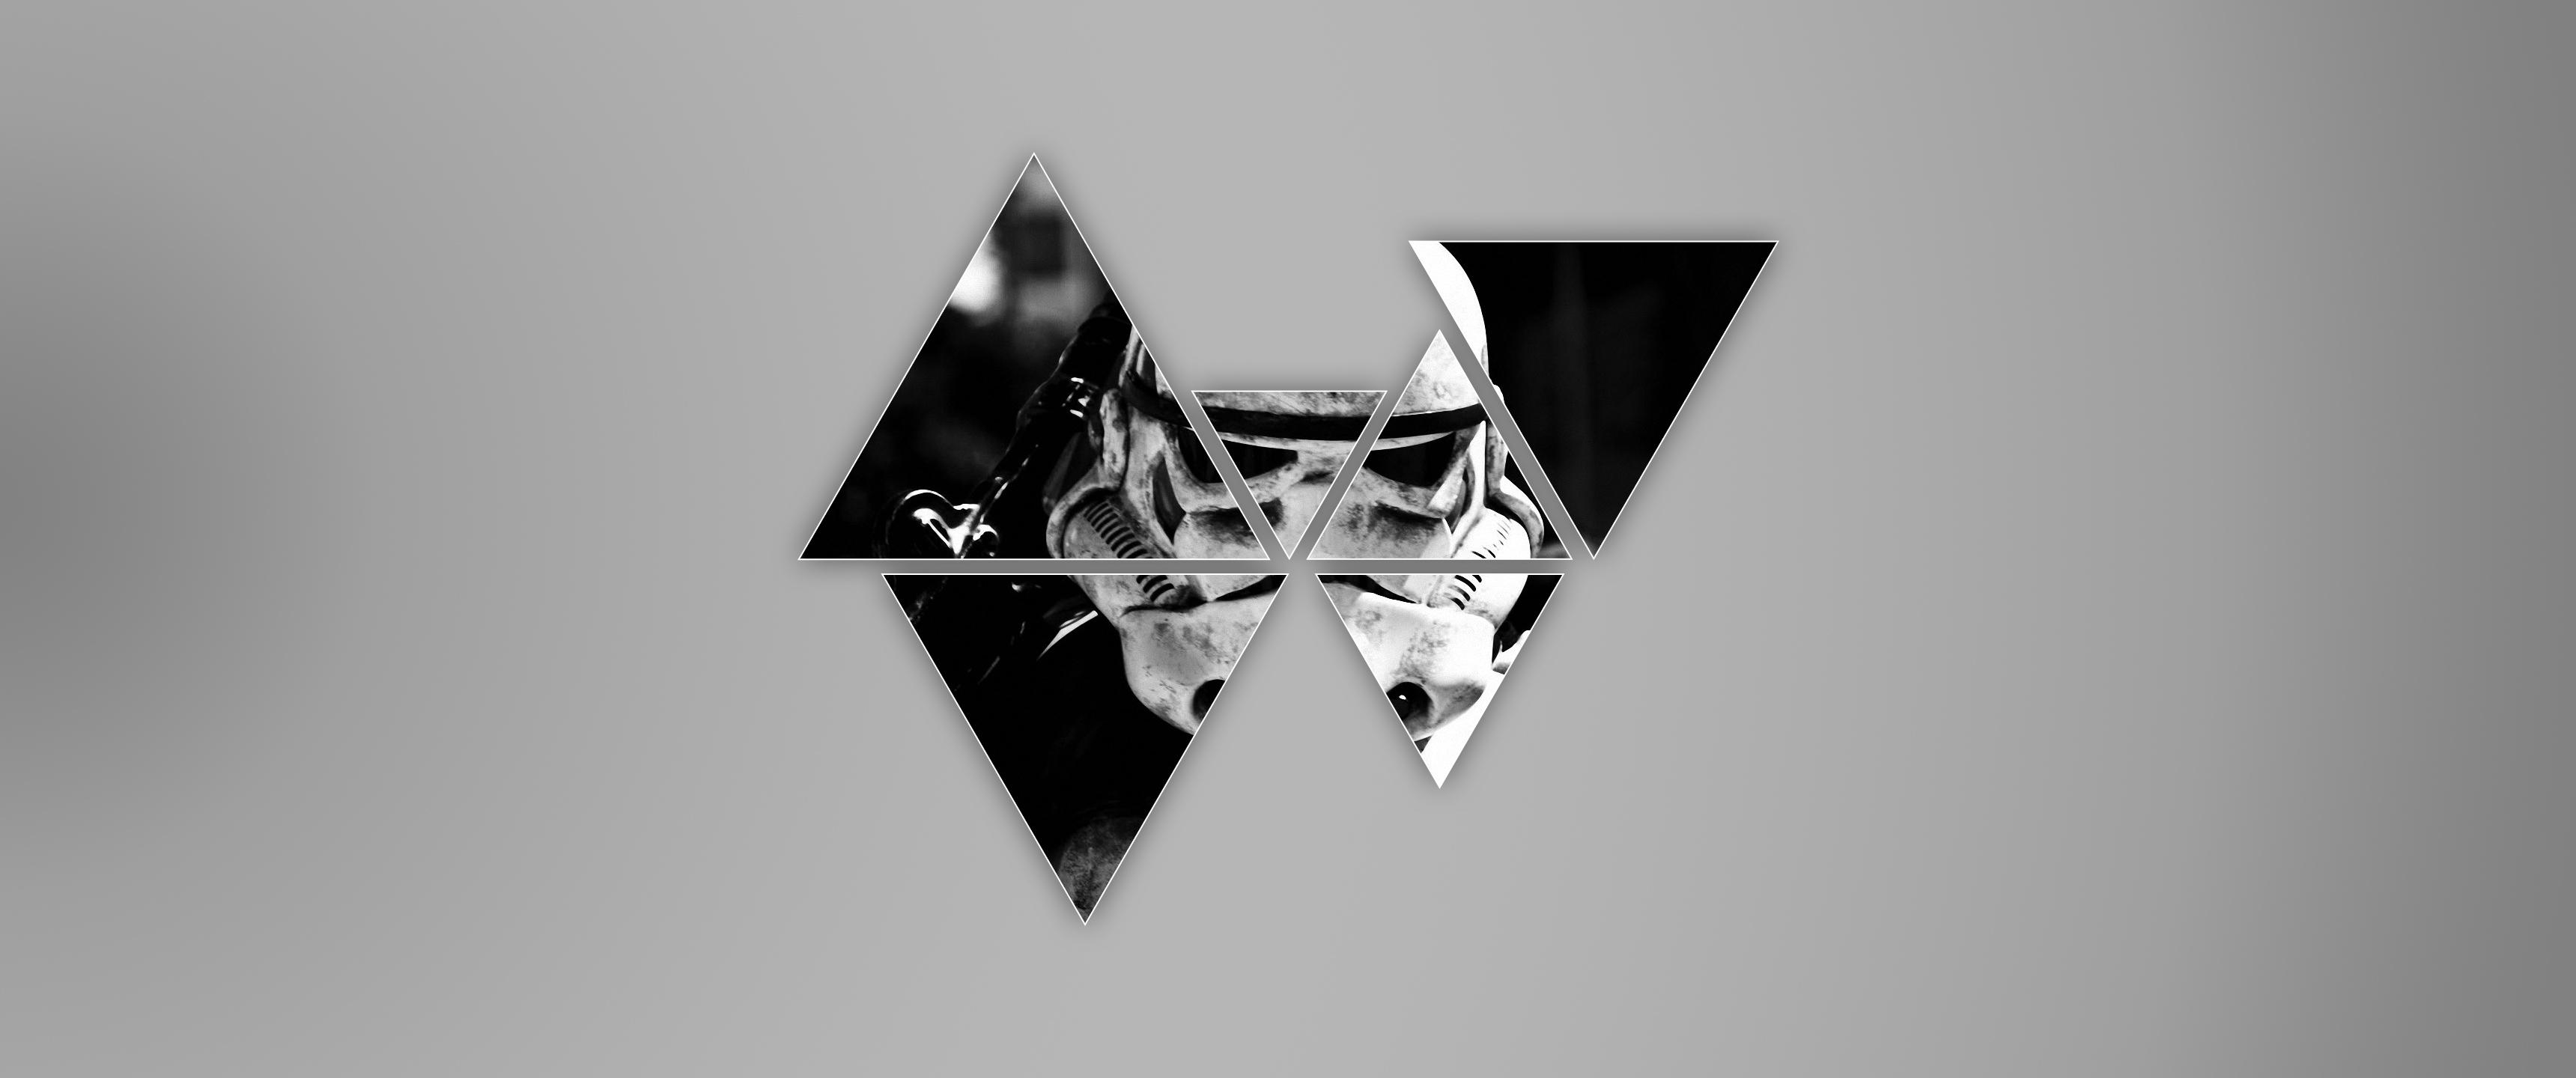 Trooper Star Wars Monochrome 3440x1440 Wallpaper Wallhaven Cc